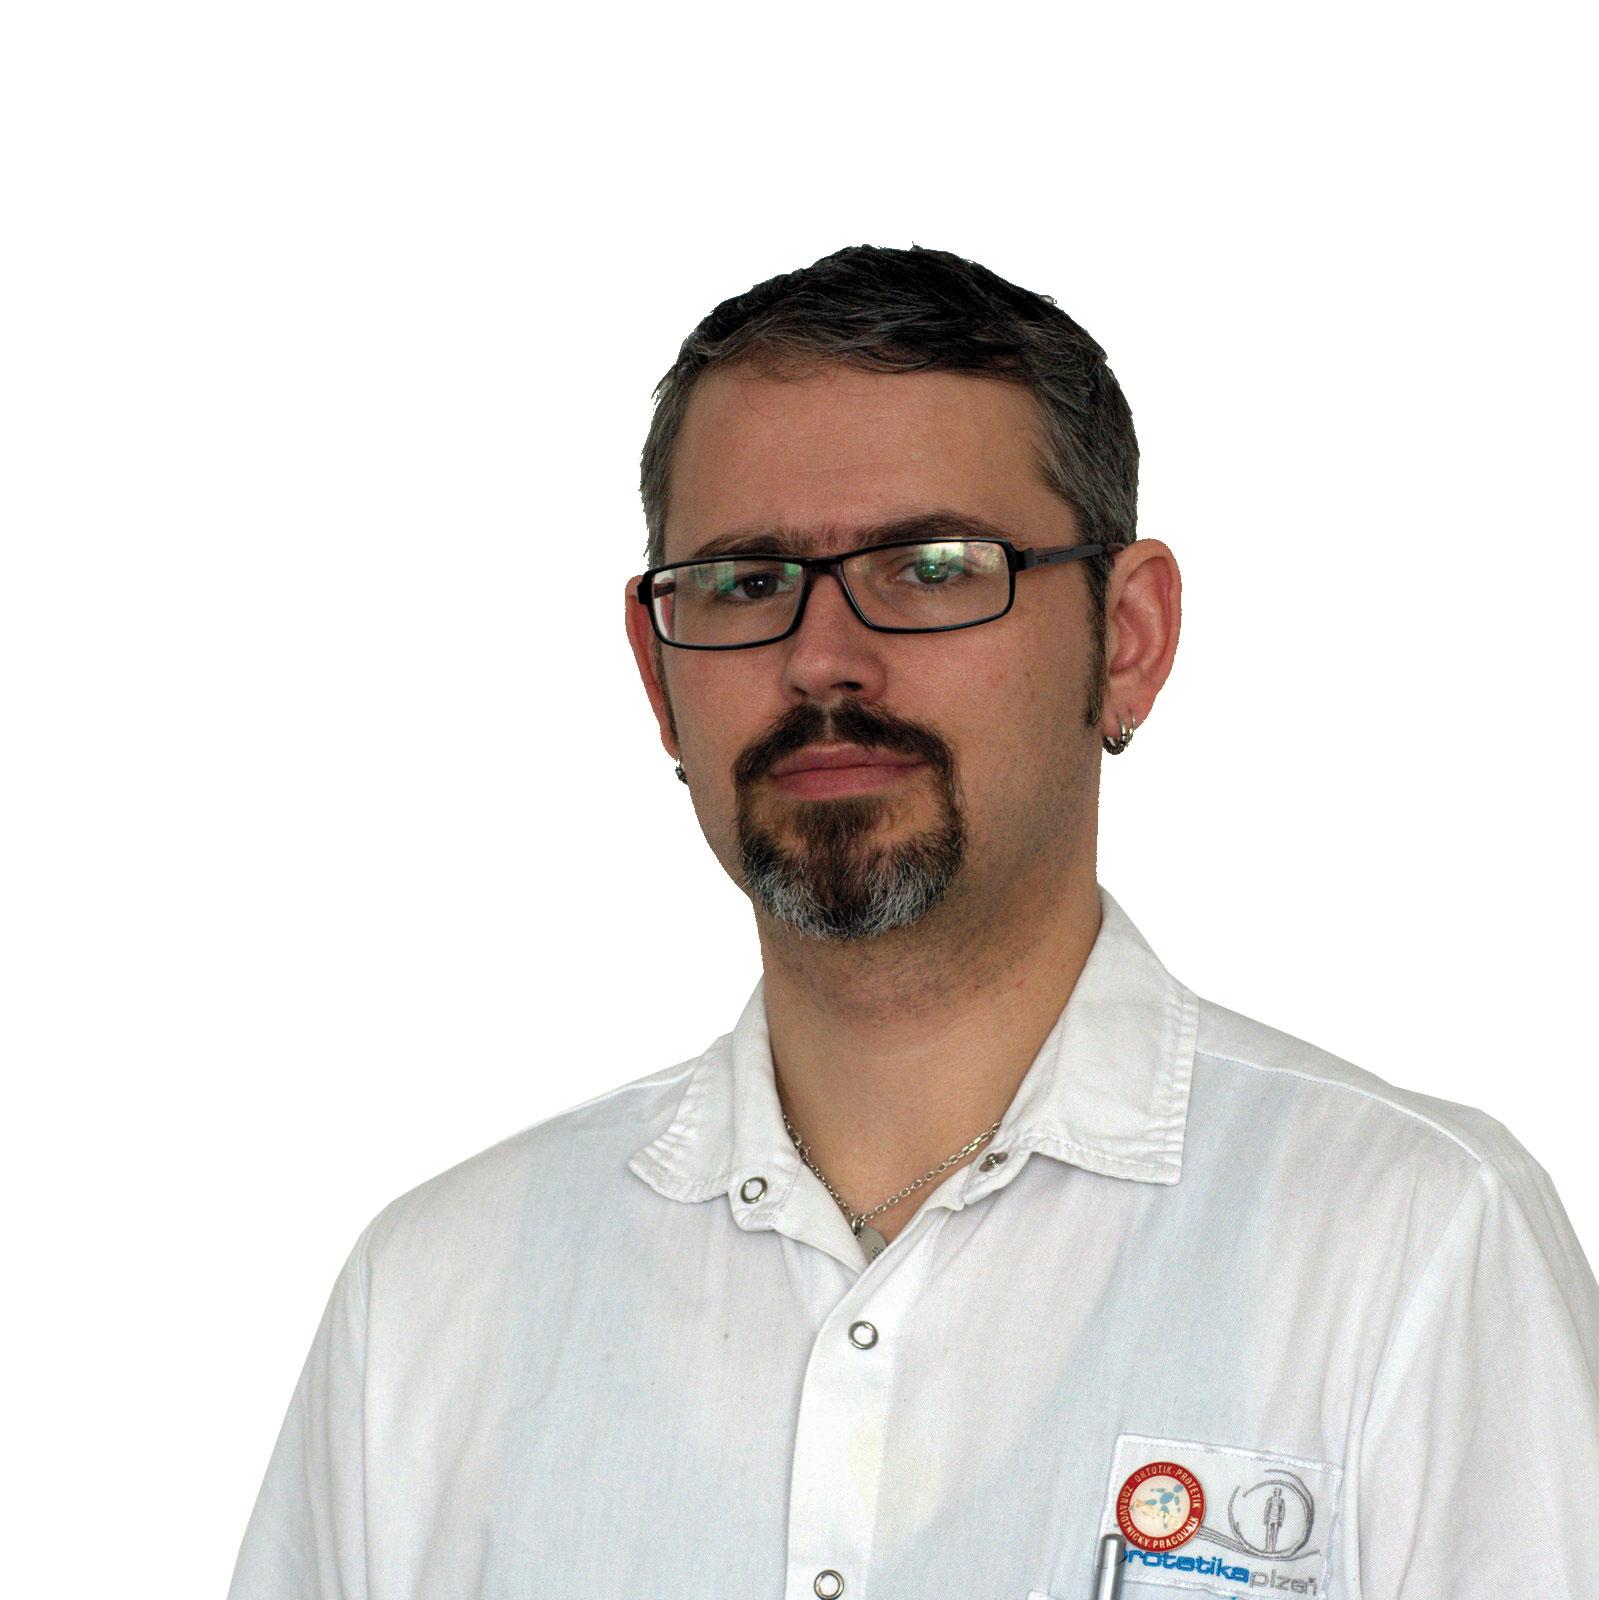 Tomáš Tykal